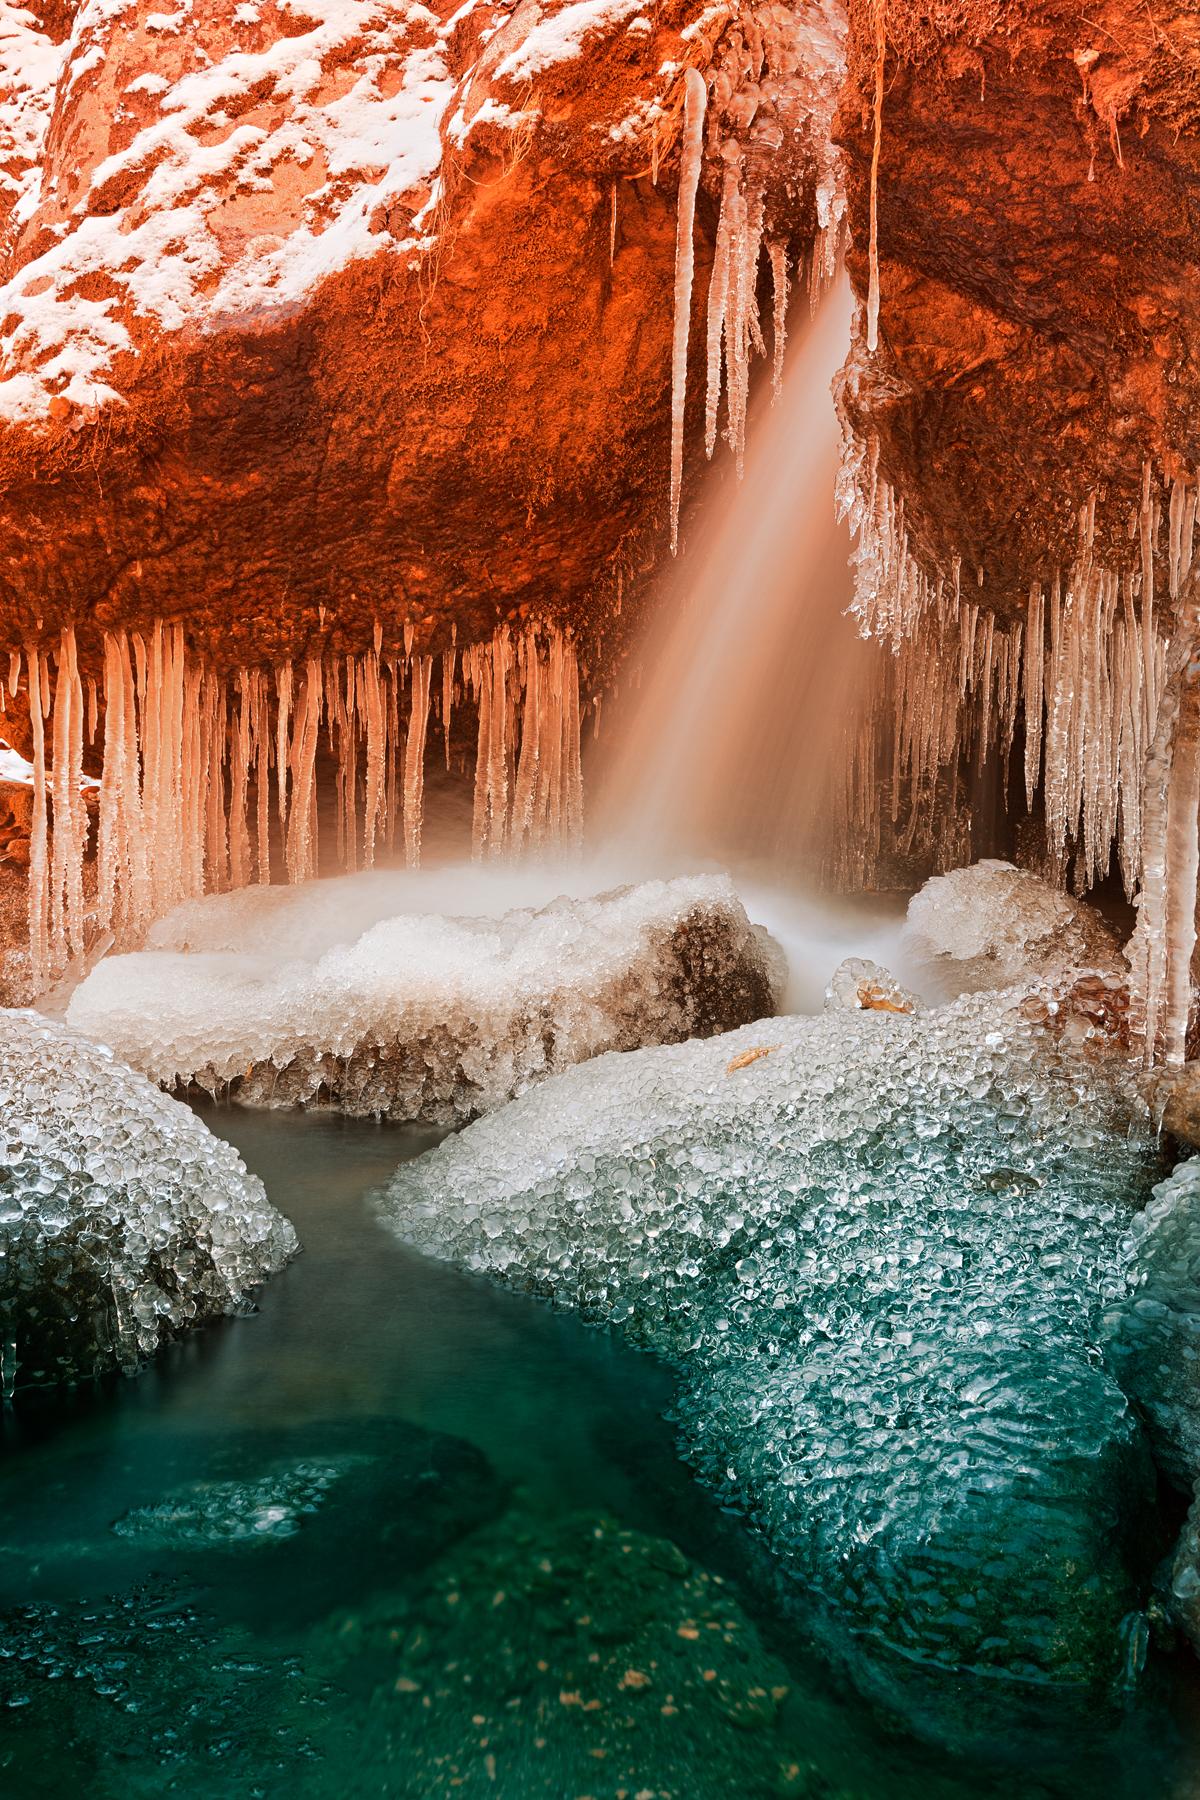 Stream of elemental hope - hdr photo